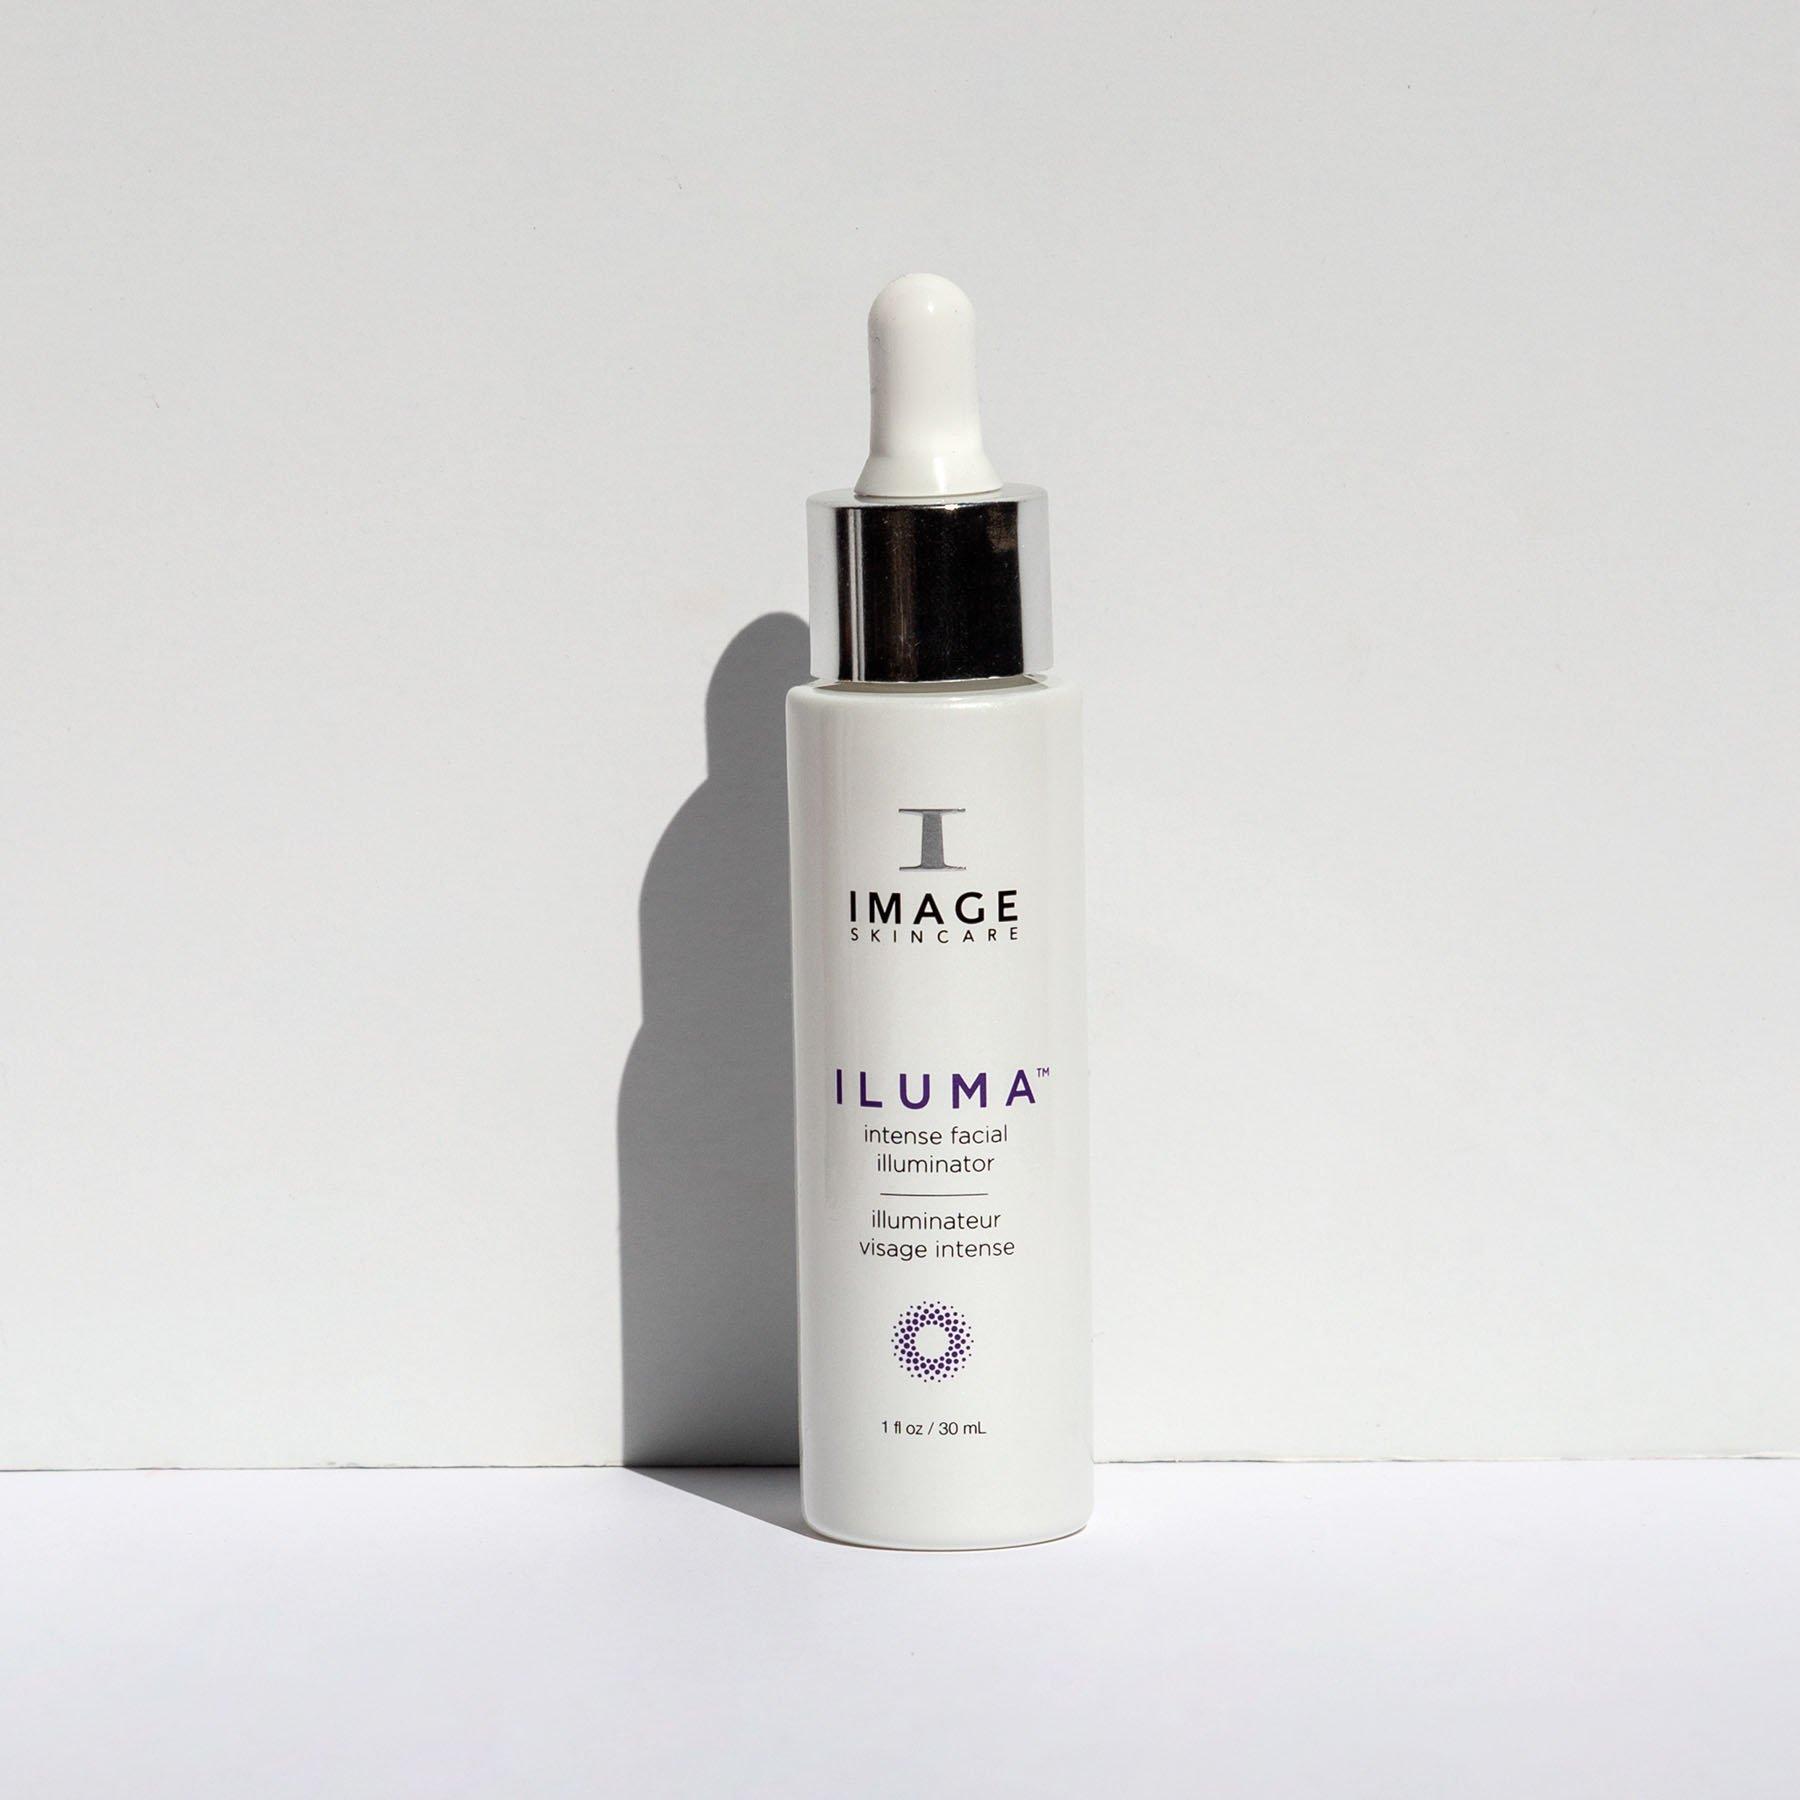 Serum giảm nám và làm trắng da Image Skincare ILUMA Intense Facial illuminator